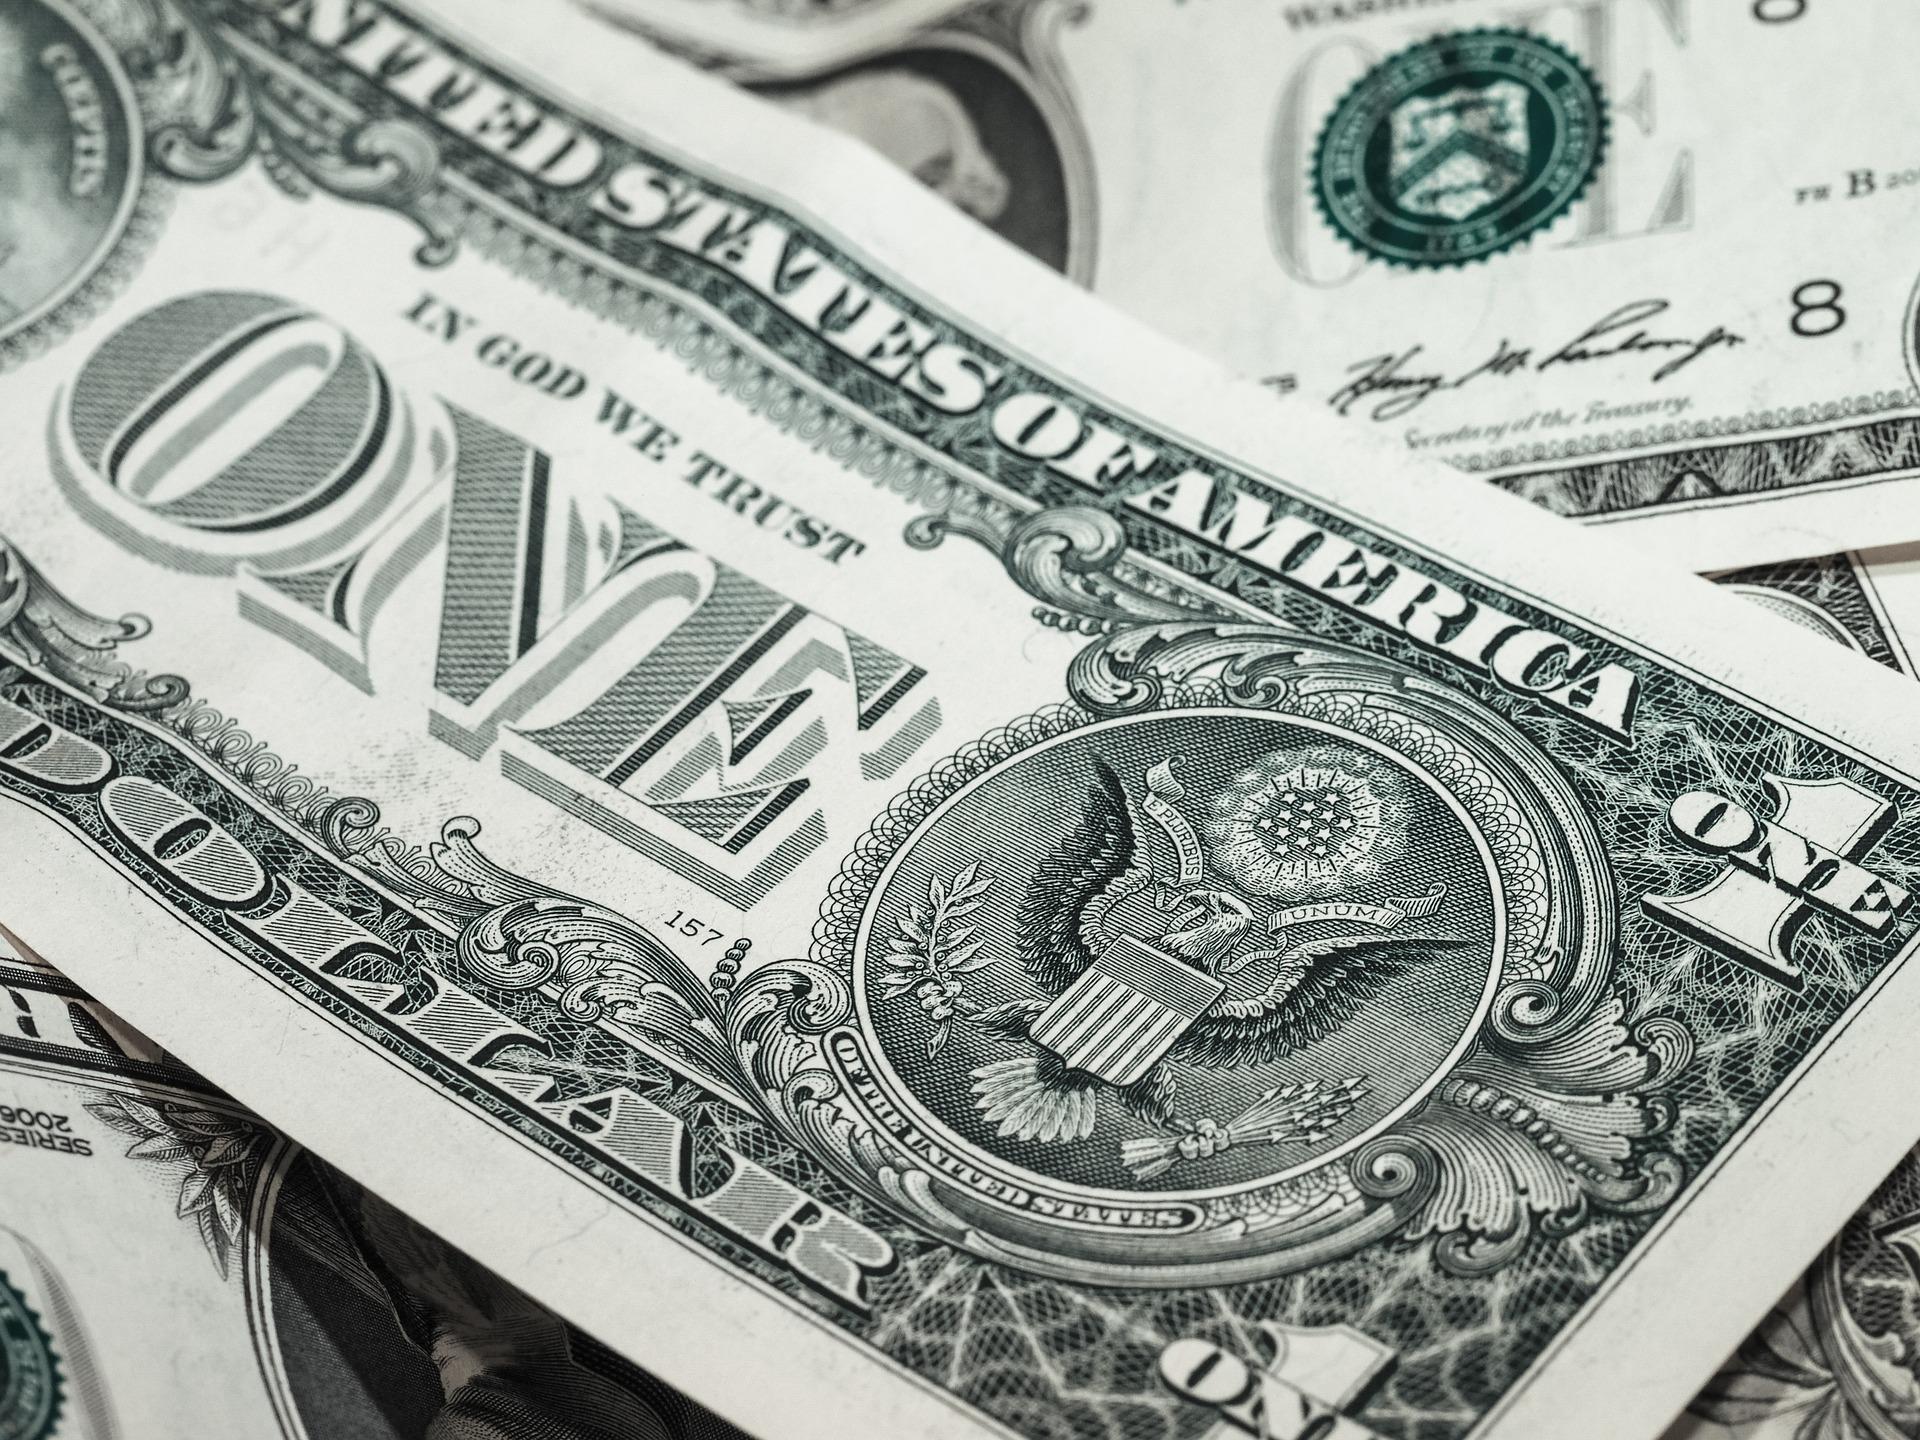 A dollar bill